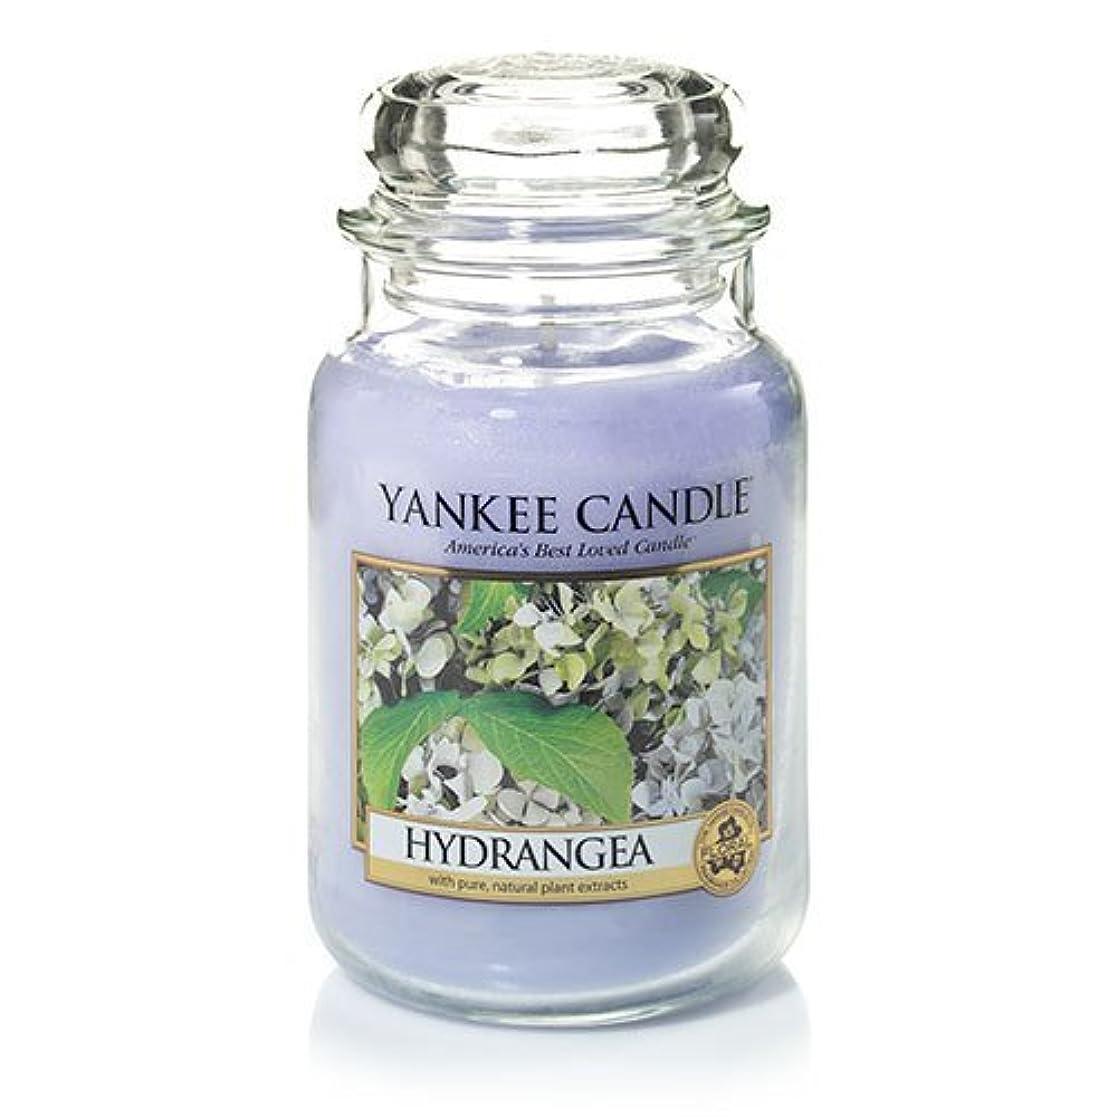 Yankee Candle Hydrangea Large Jar Candle、新鮮な香り